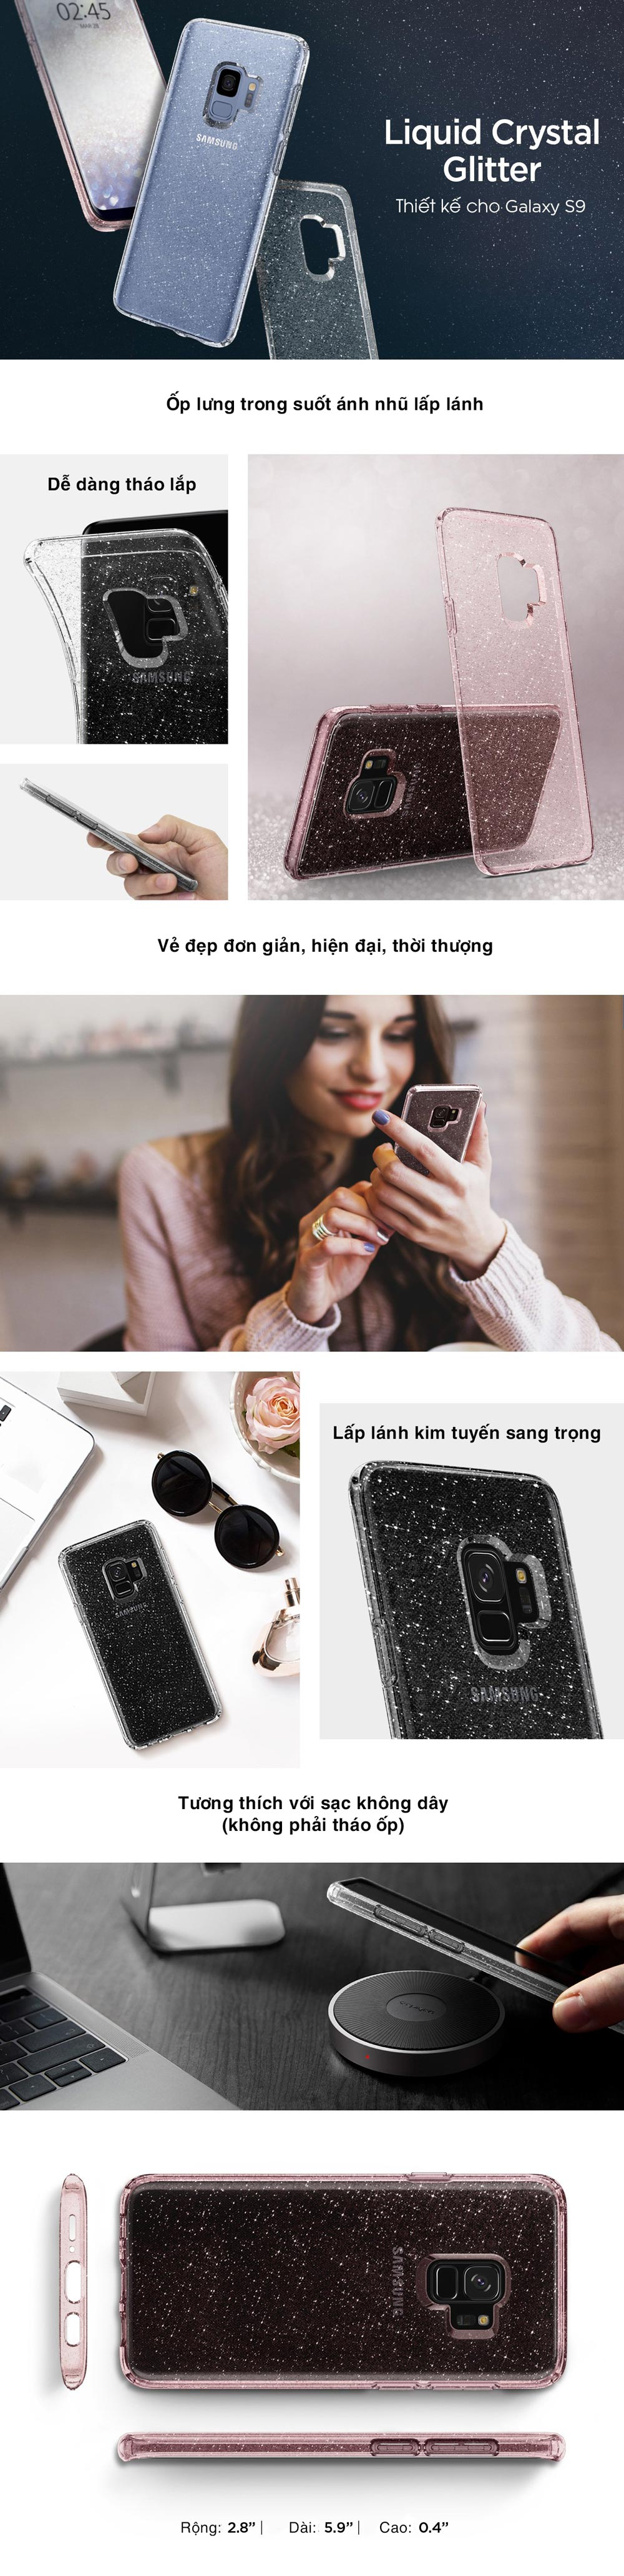 Samsung S9 Case Spigen Liquid Crystal Glitter